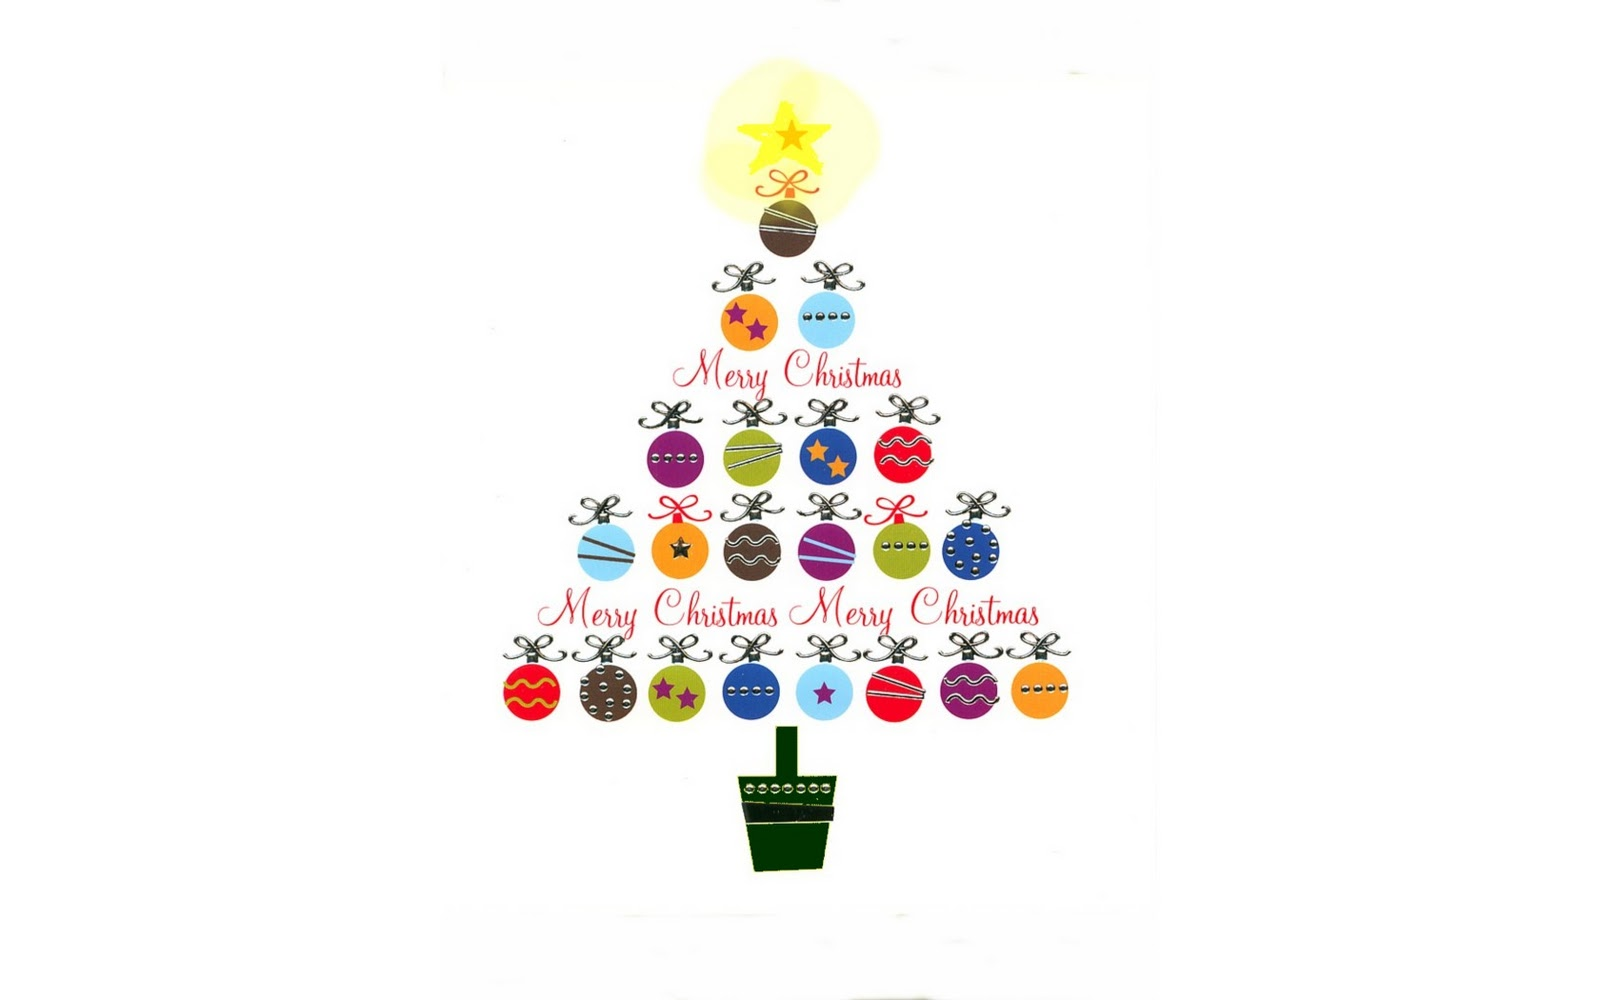 http://3.bp.blogspot.com/-DHjCFUVOyrs/Tu-3RQgpuWI/AAAAAAAAEU0/XXFkZBo3PeE/s1600/Merry+Christmas+-+Wallpaper.jpg